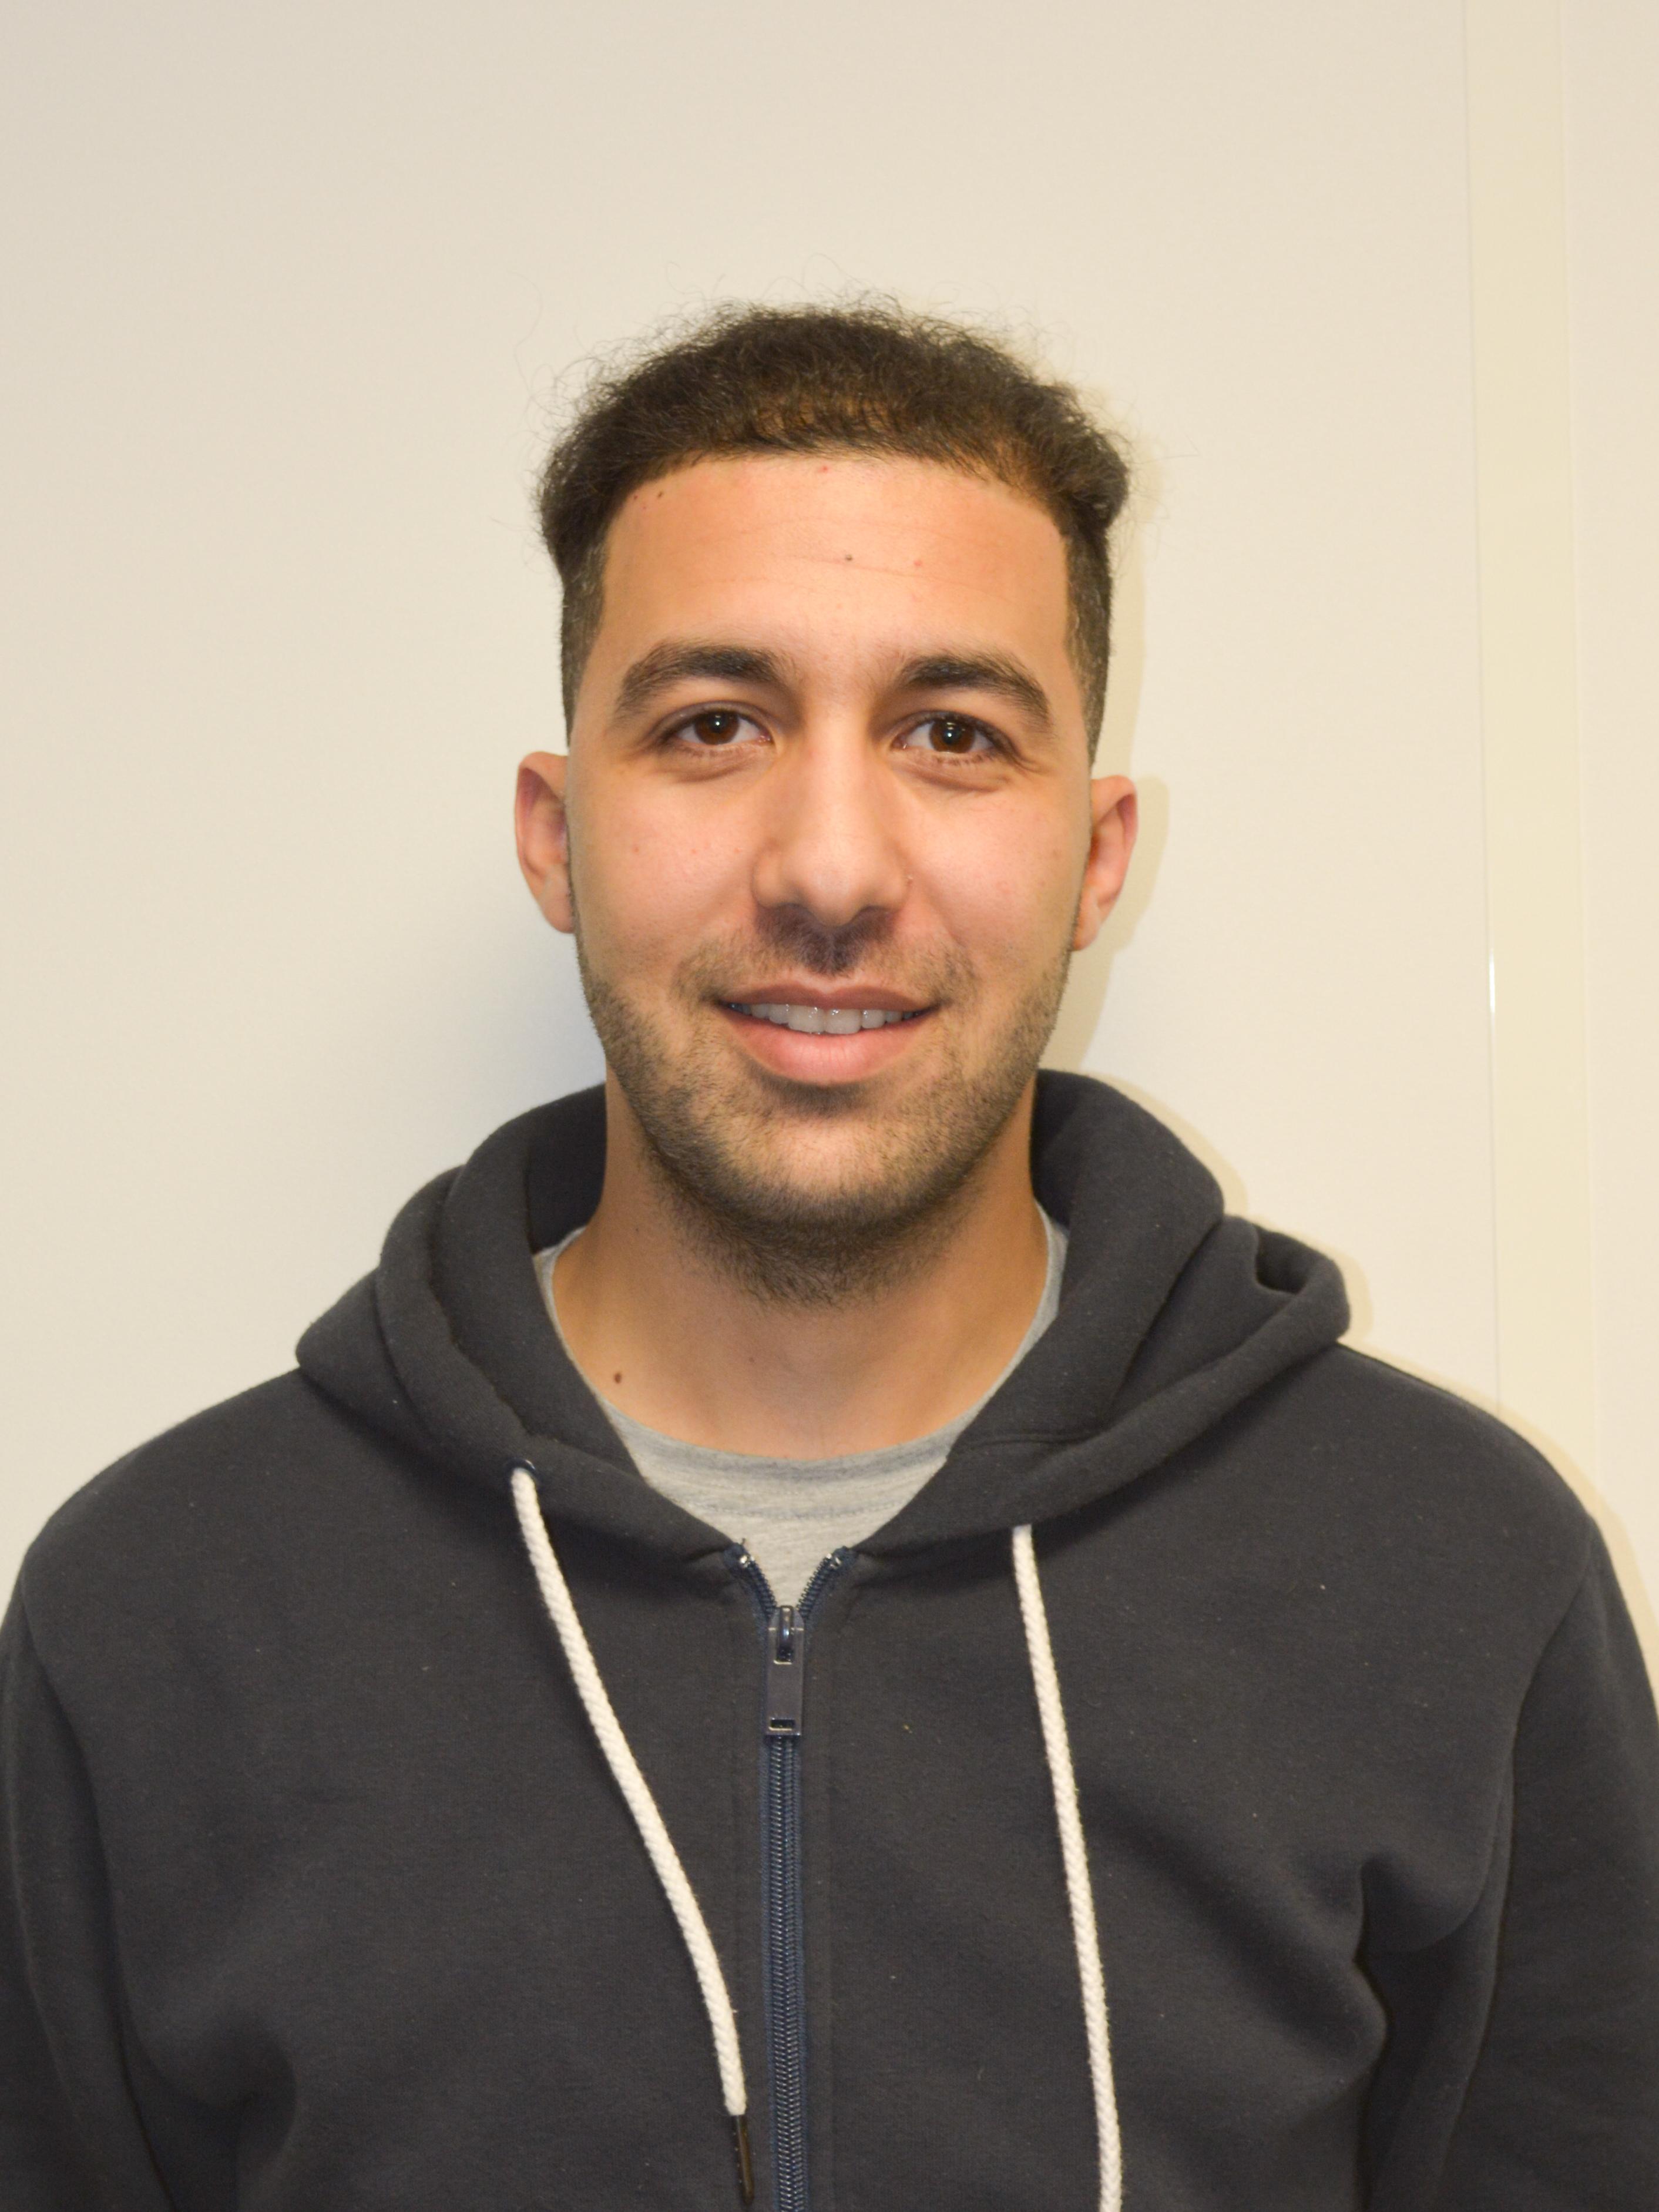 Mehdi Boufraine